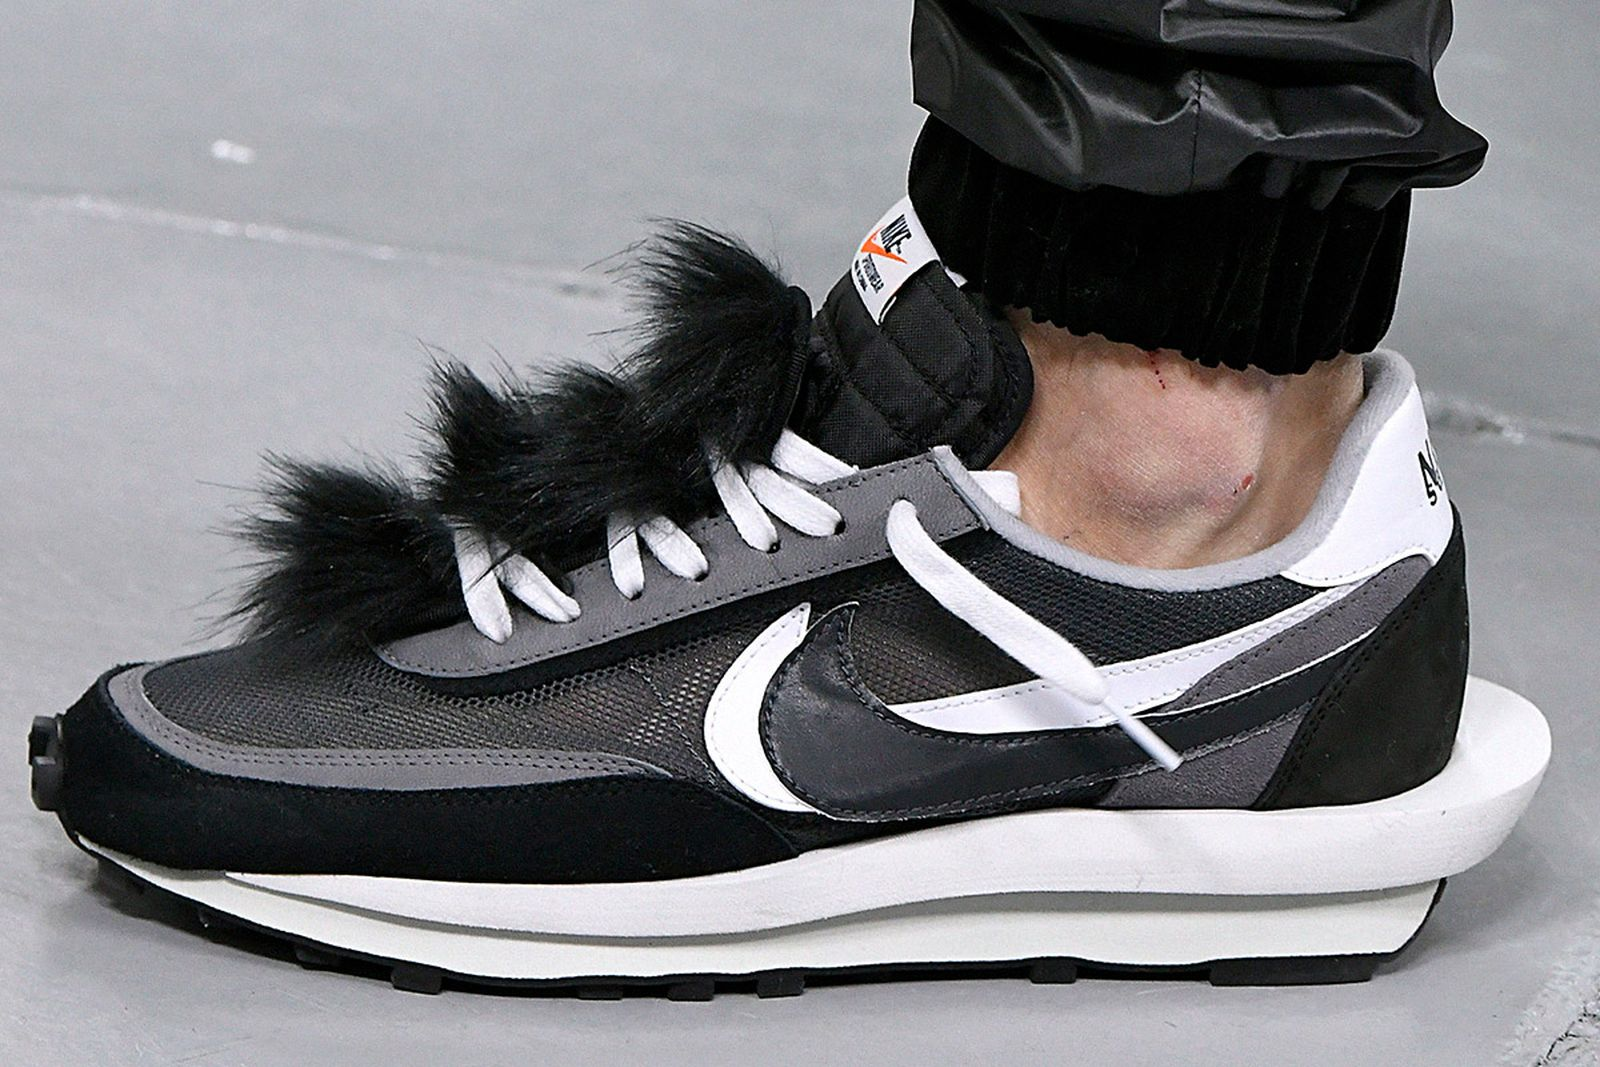 fw19 fashion week sneakers main Acne Studios Nike OFF-WHITE c/o Virgil Abloh